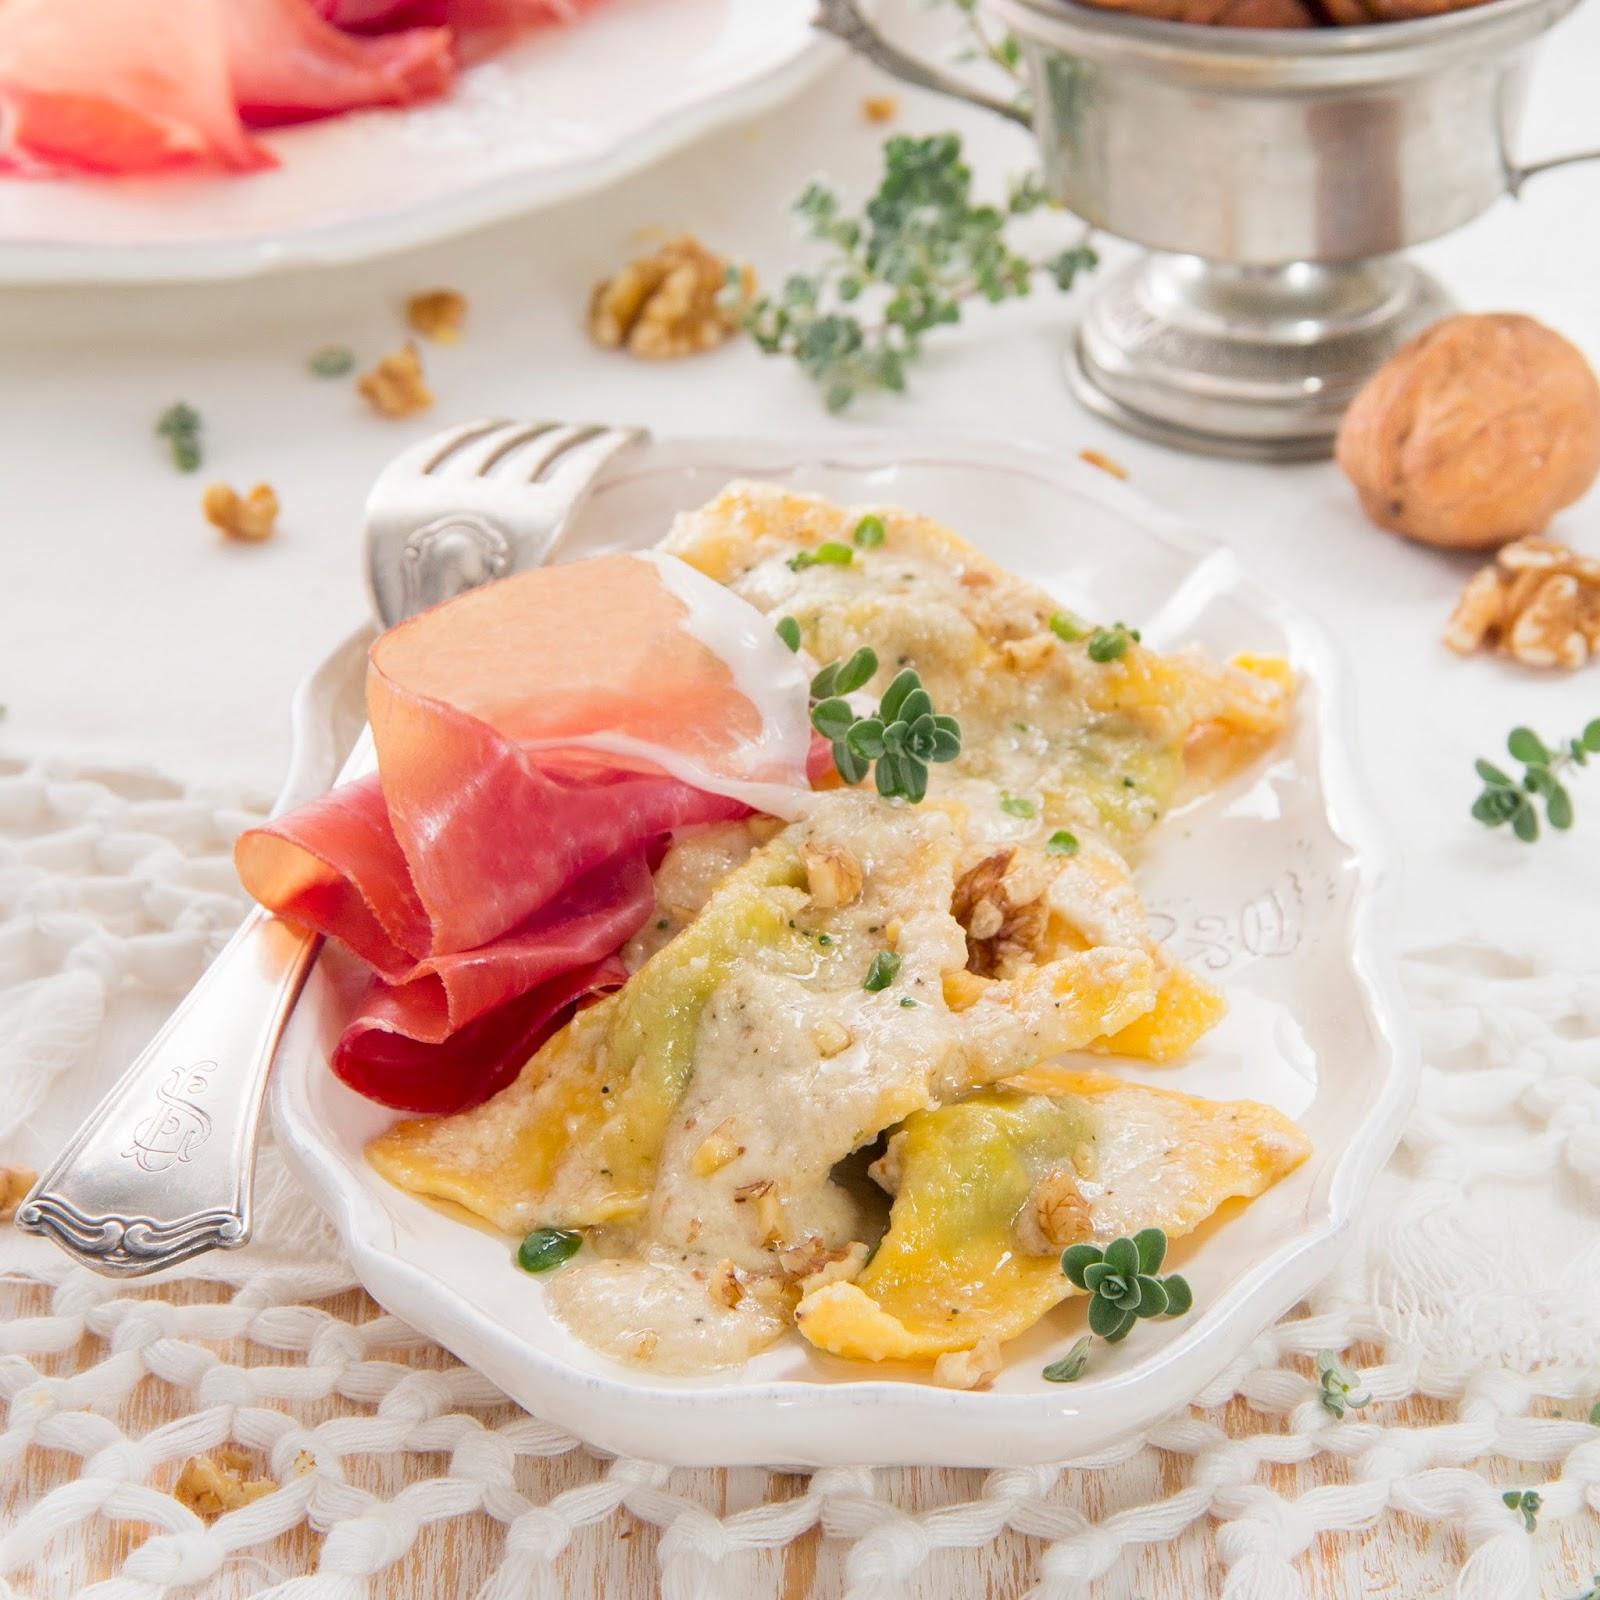 Ravioli With Walnut Pesto And Parma Ham